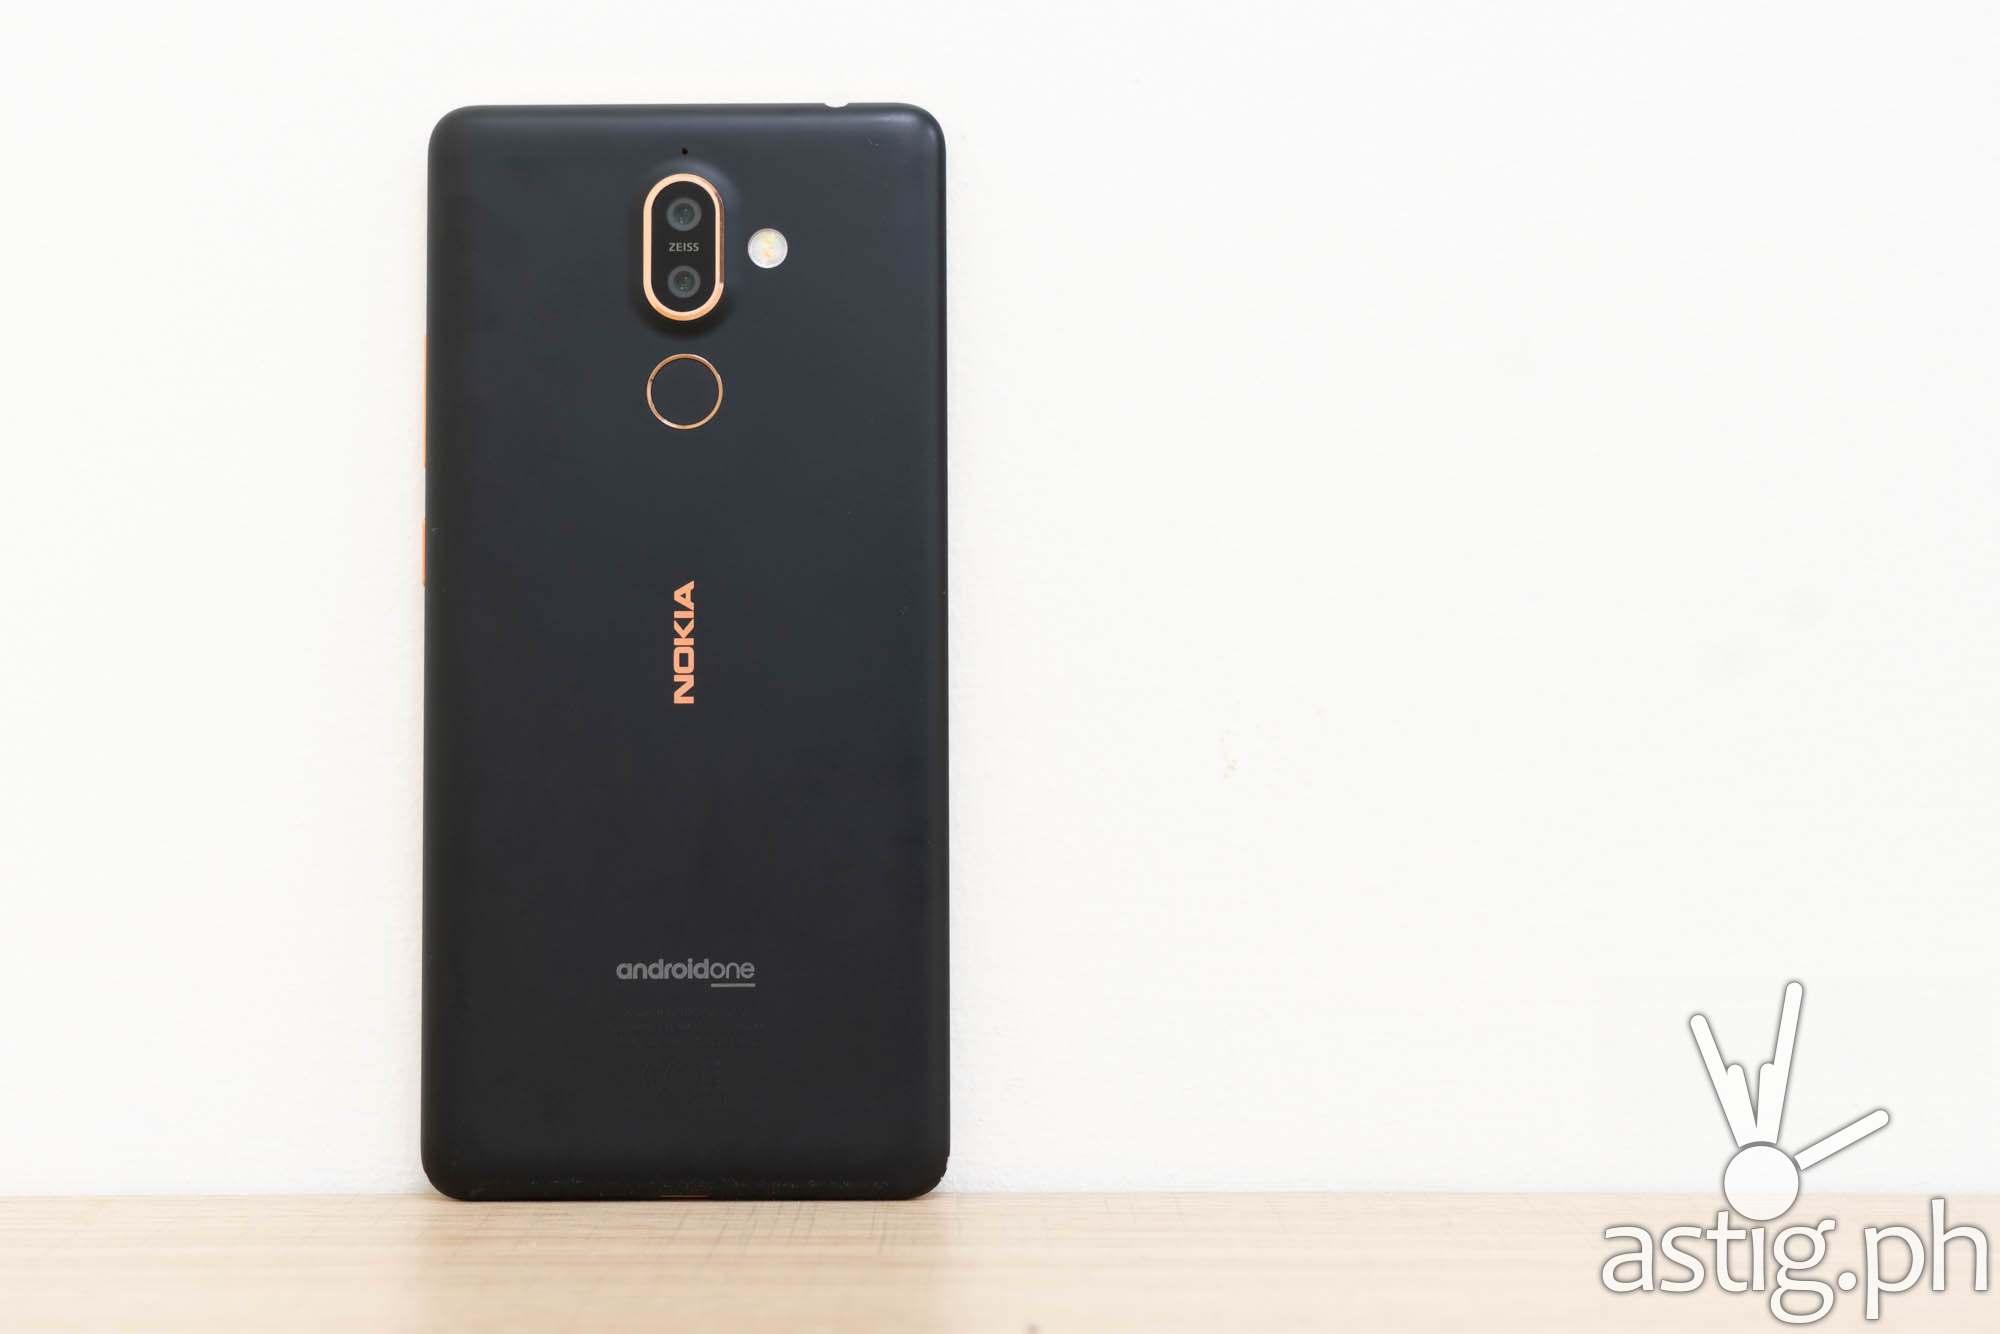 Standing back - Nokia 7 Plus (Philippines)